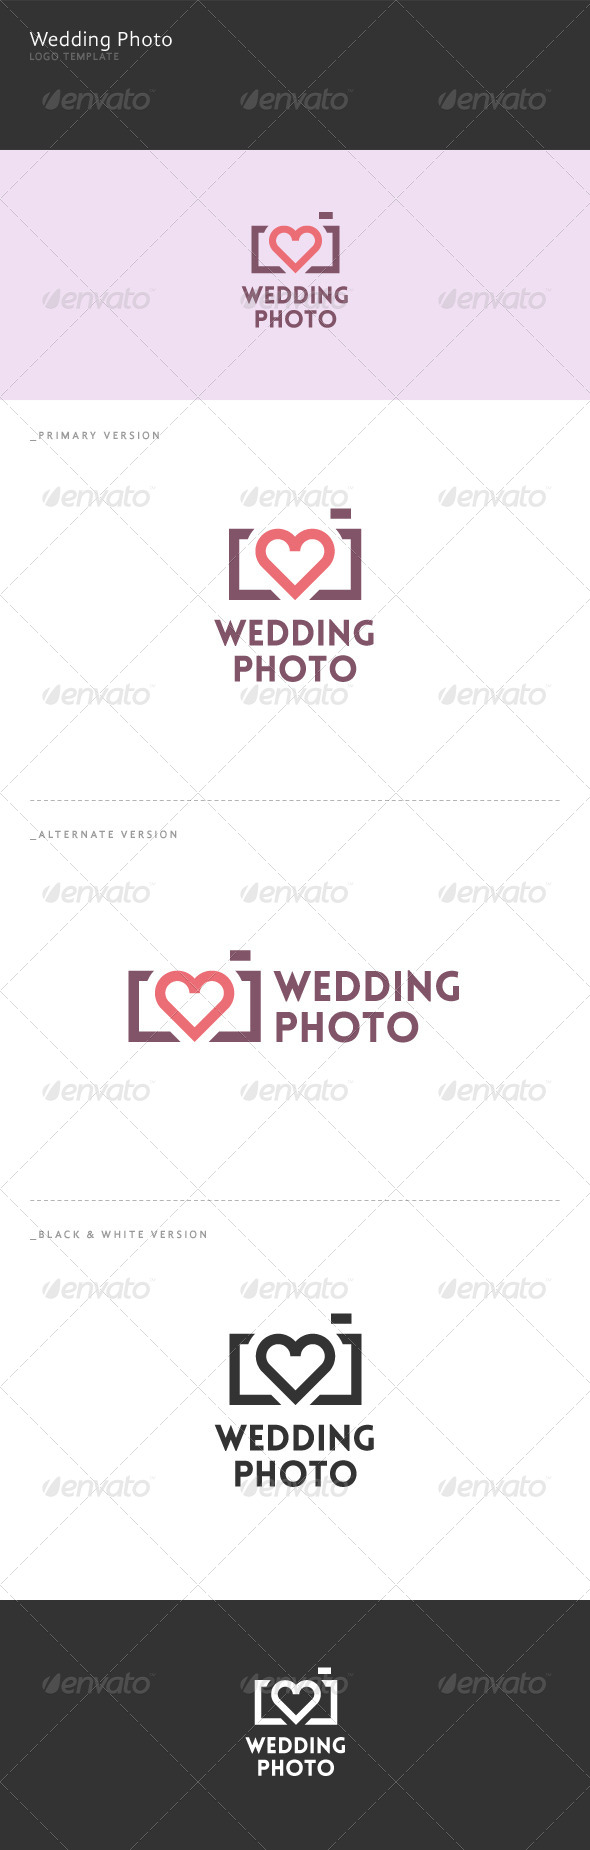 GraphicRiver Wedding Photo Logo 6044259